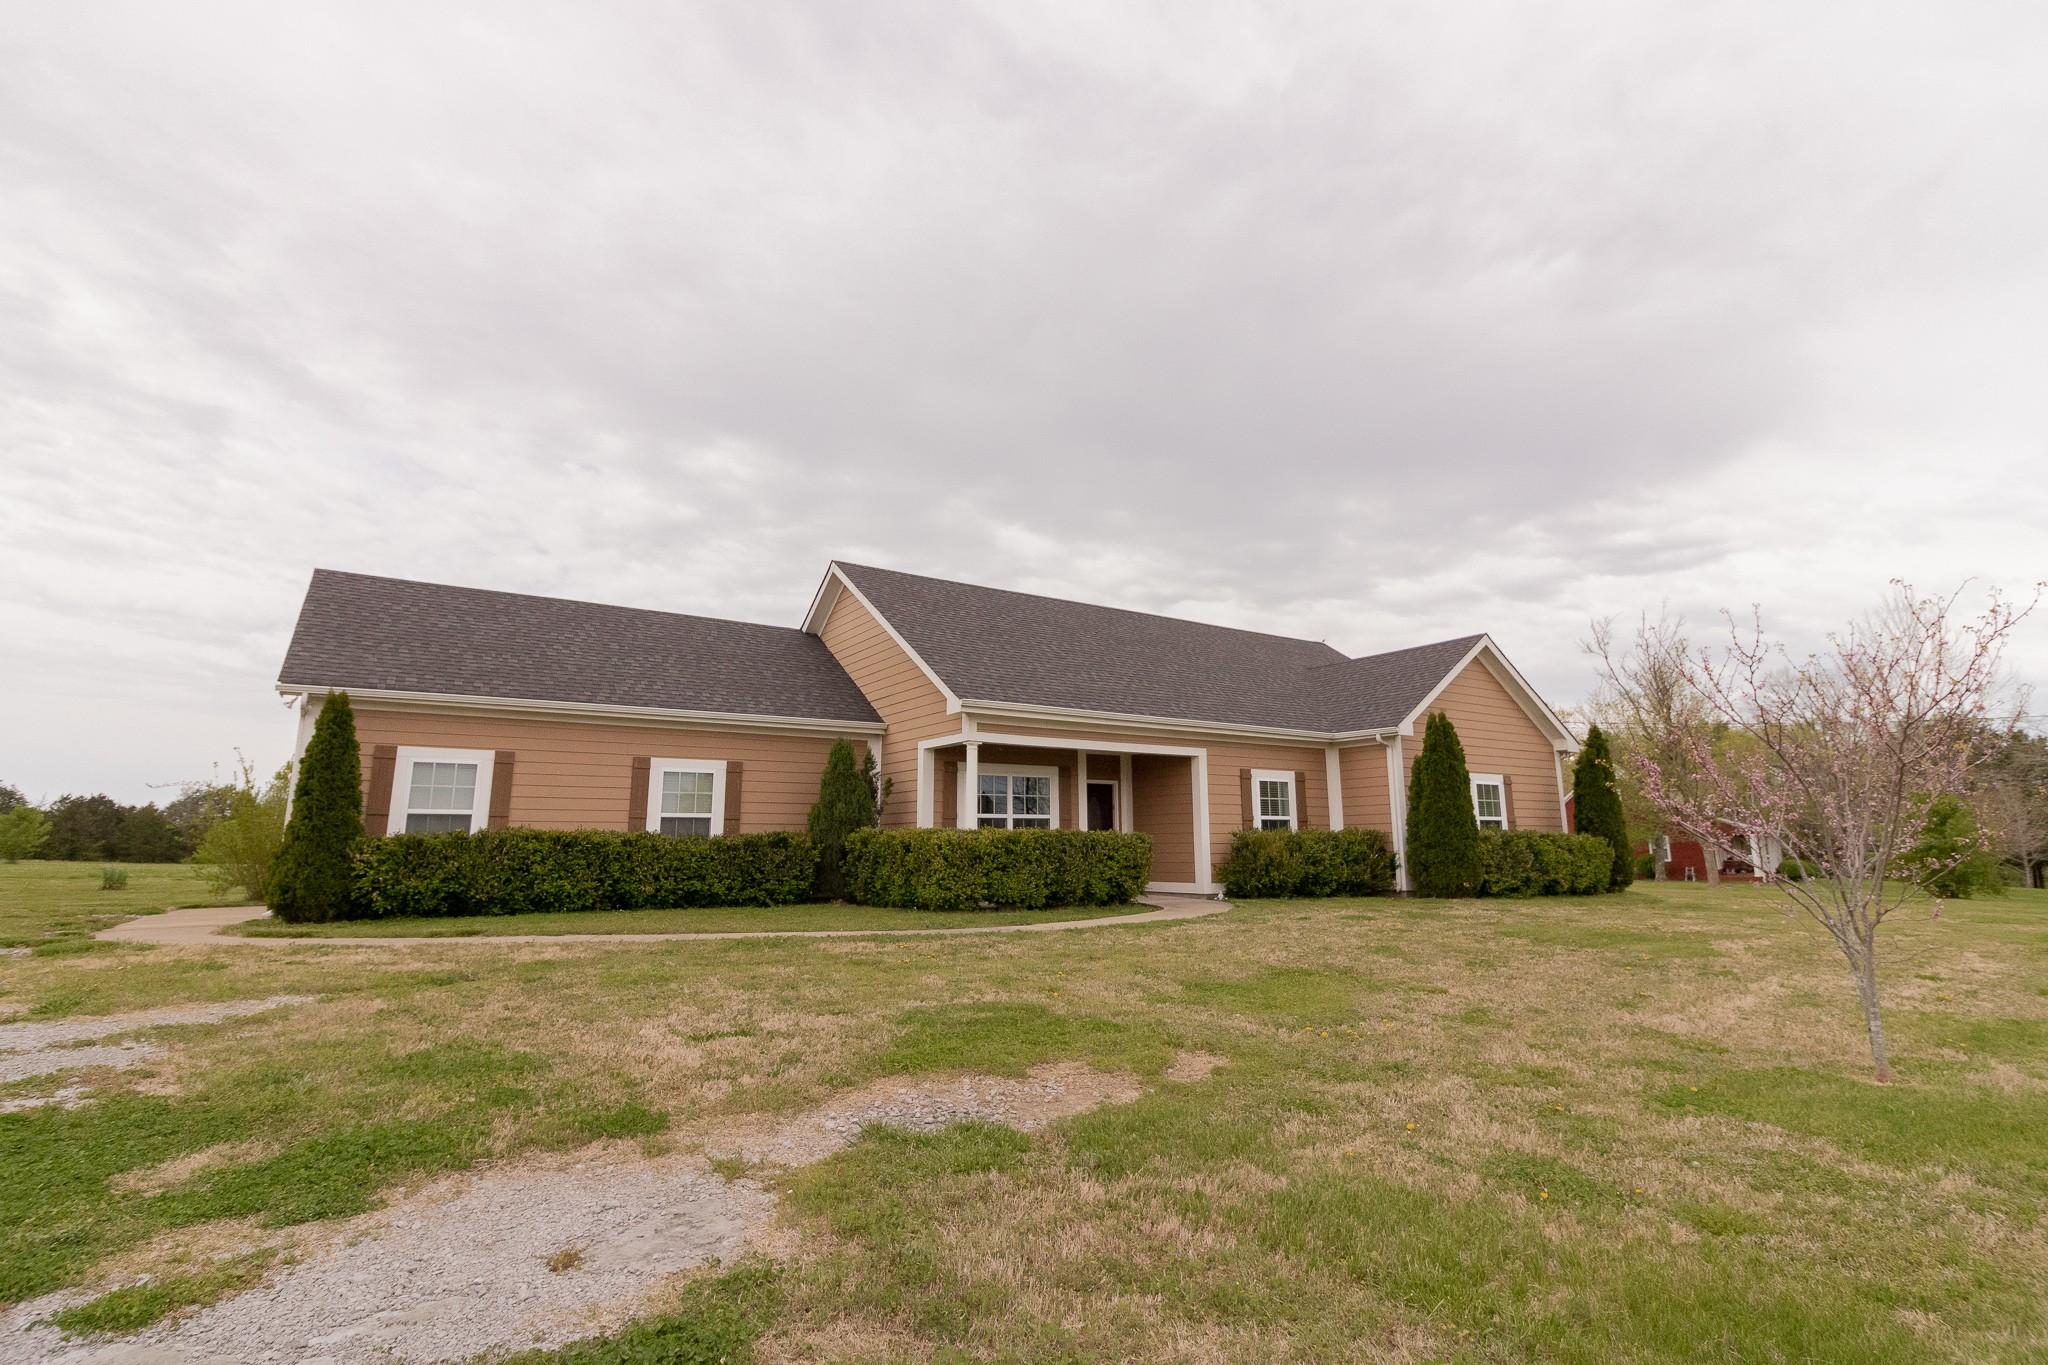 6465 Lofton Rd Property Photo - Lascassas, TN real estate listing